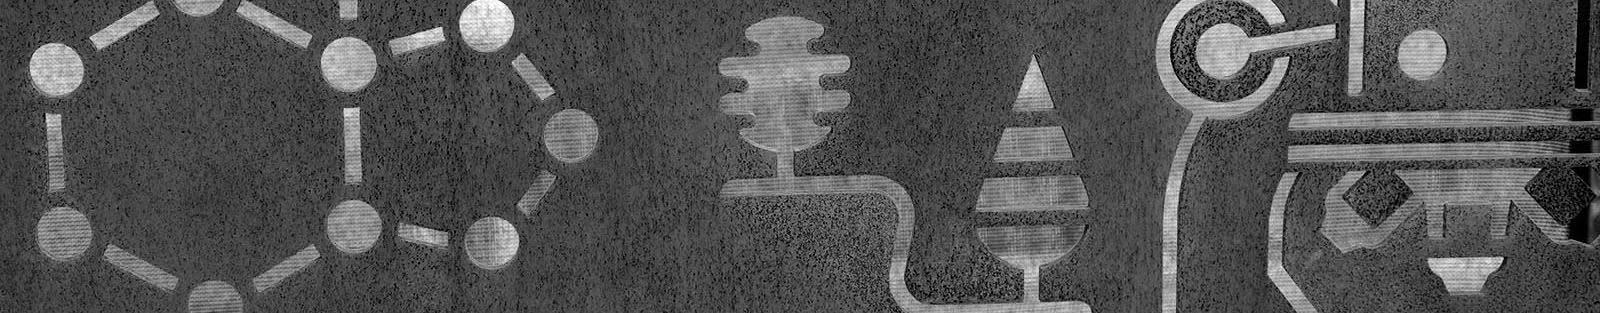 Vitamin D molecule depicted in steel art